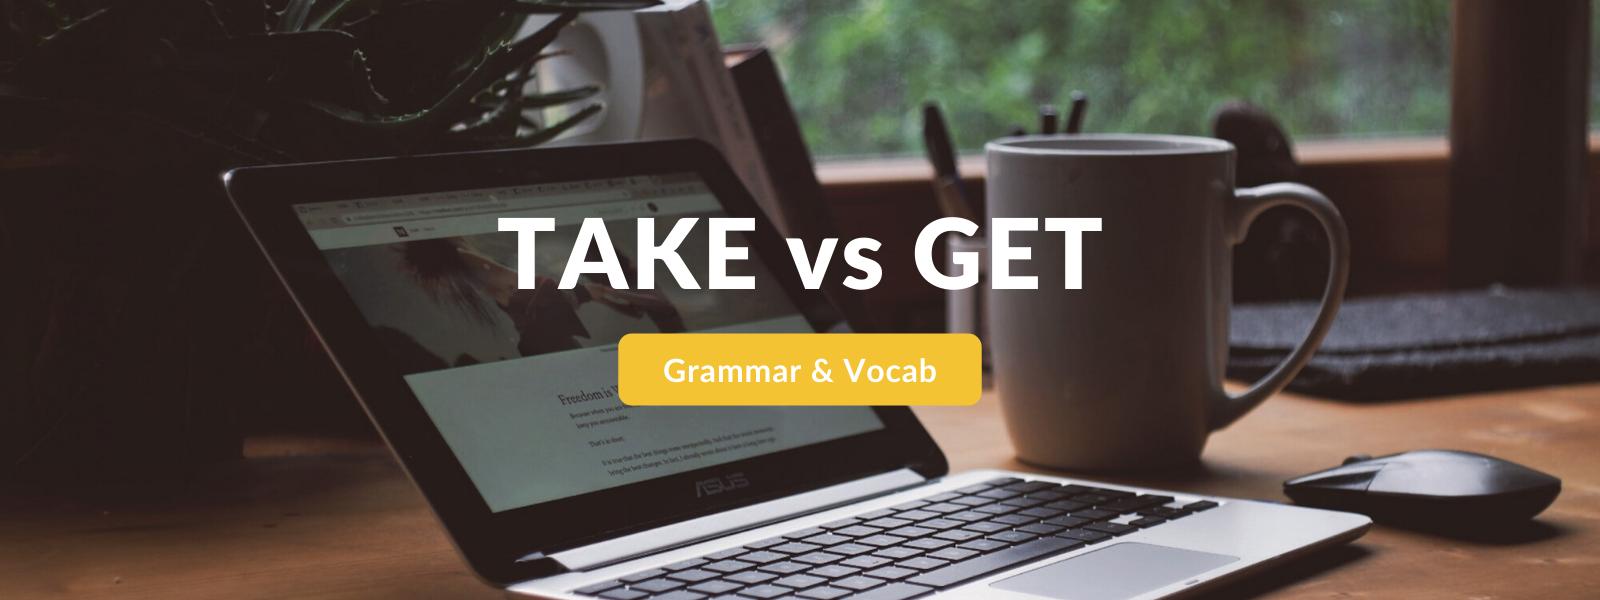 TAKE vs GET - English Grammar Tips - Talaera Business English Course